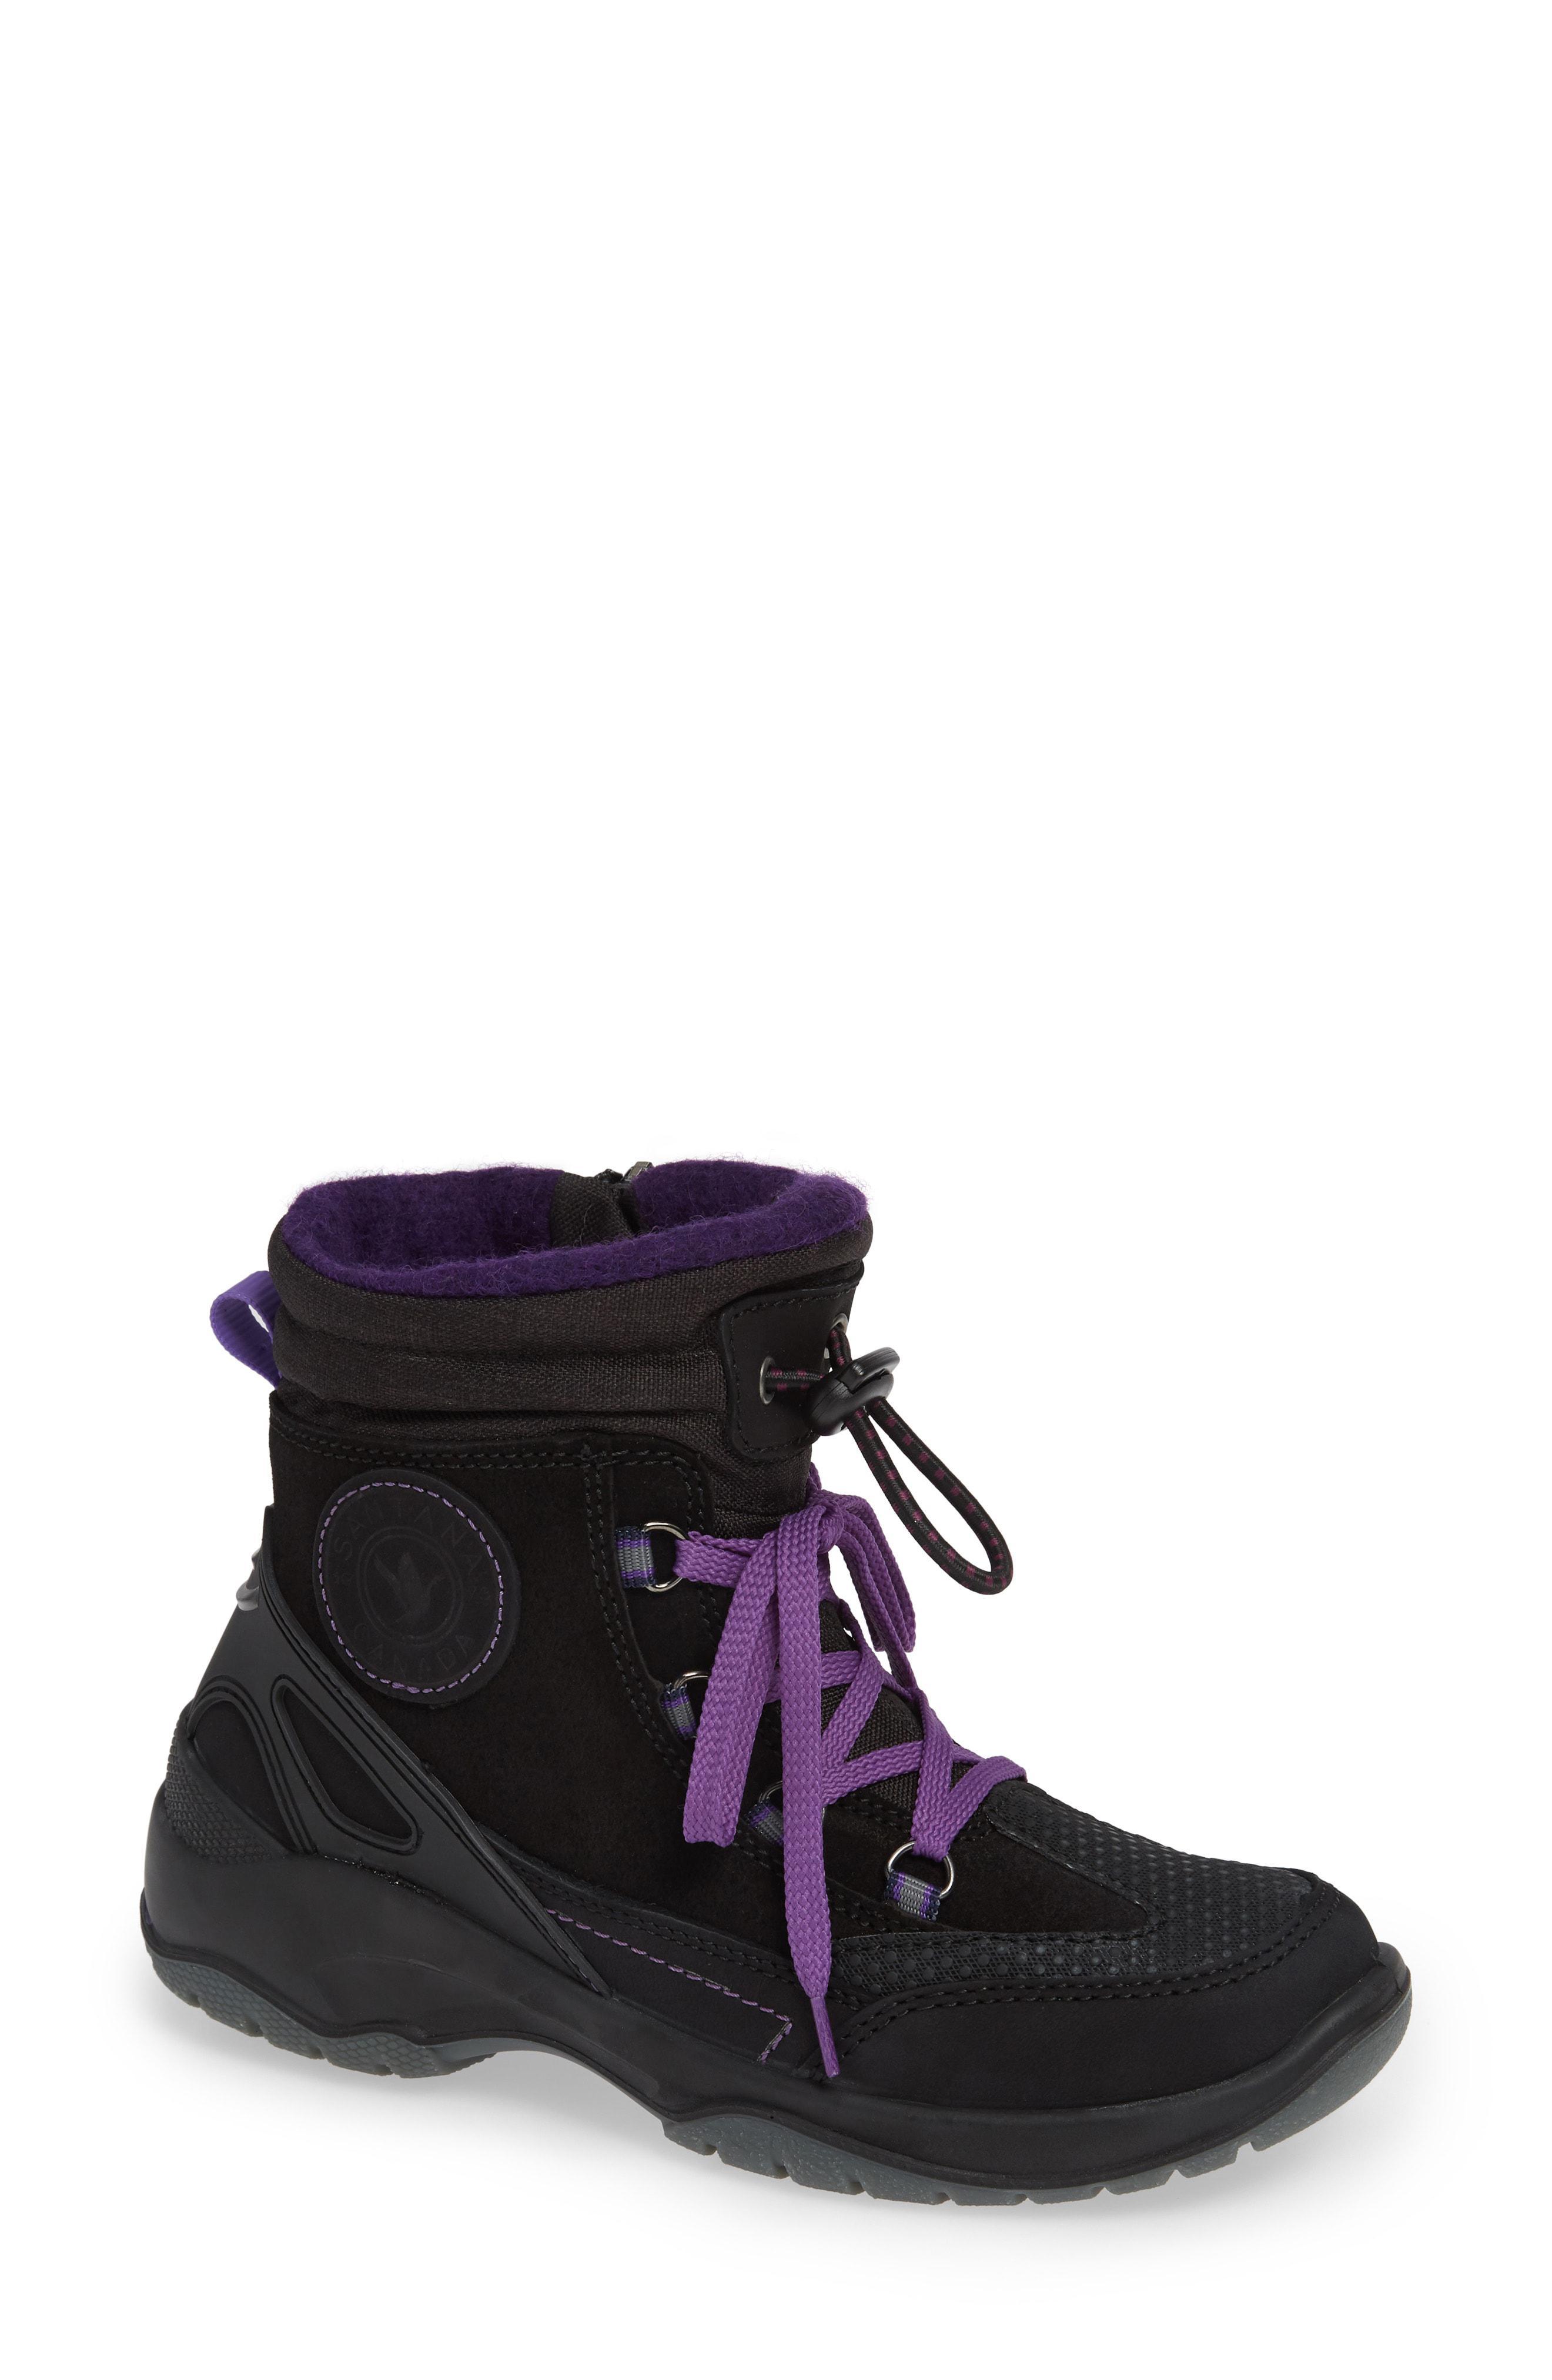 1bad86560 Santana Canada. Women's Purple Torino Waterproof Insulated Lace-up Winter  Boot